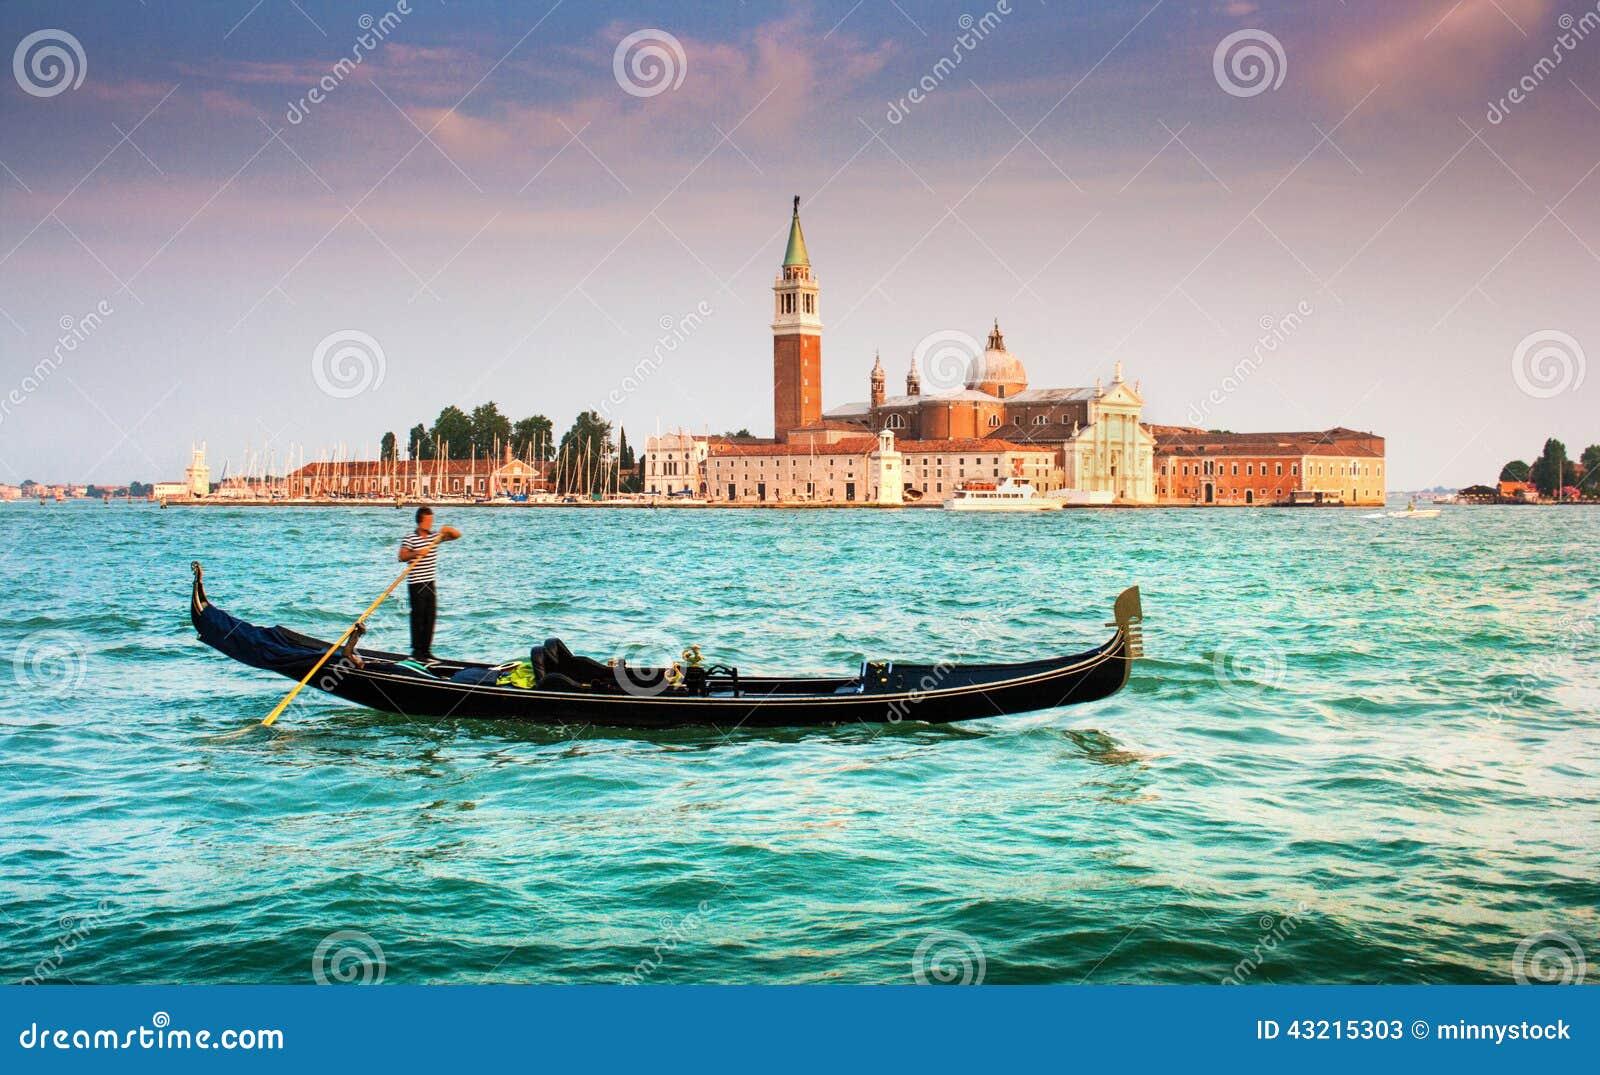 Gondola On Canal Grande With San Giorgio Maggiore At Sunset, Venice, Italy Stock Photo - Image ...